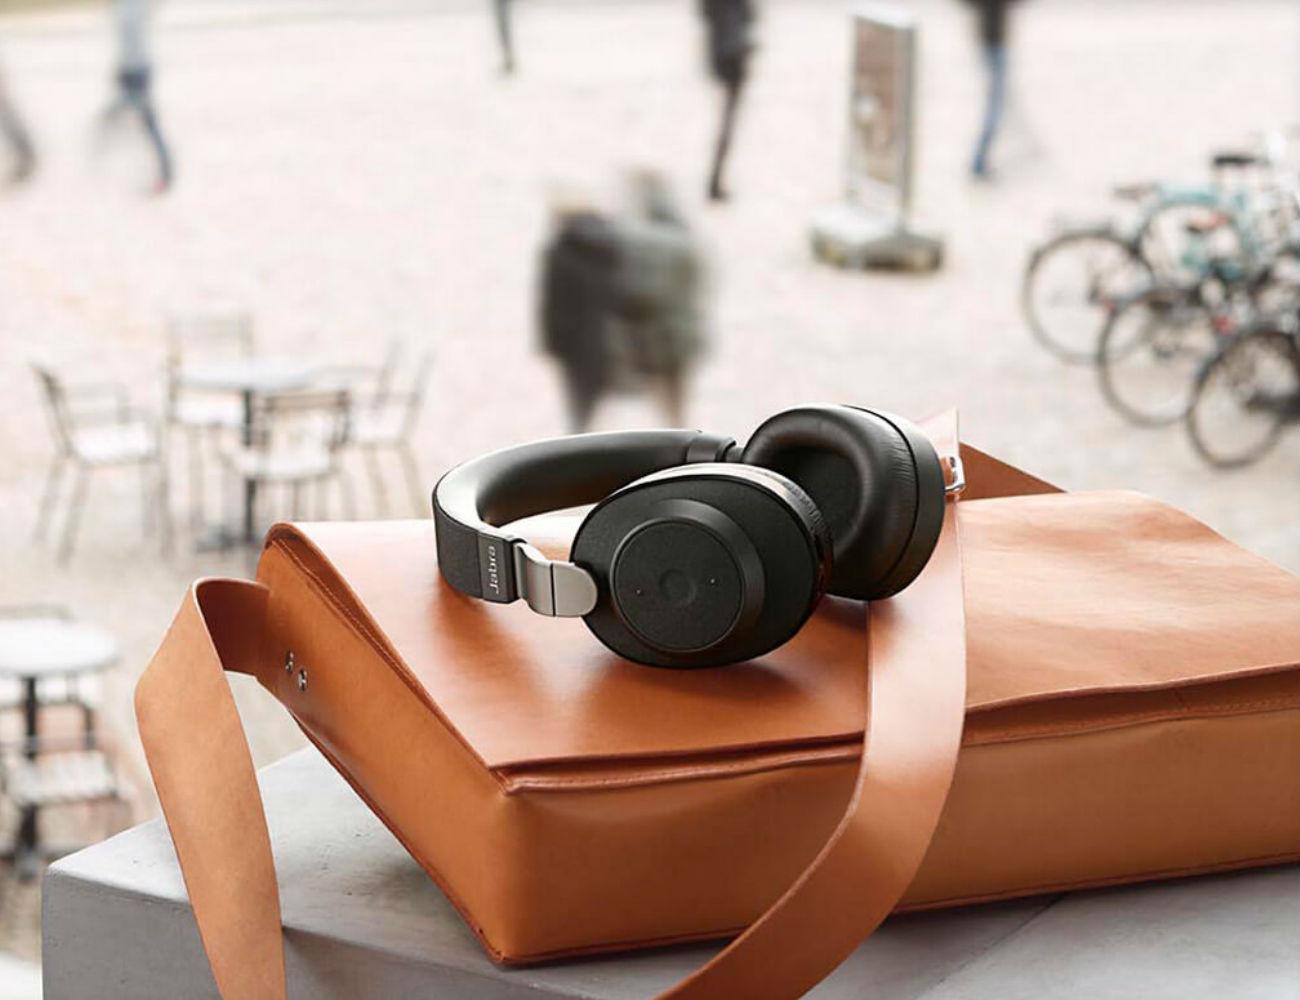 Jabra Elite 85h Adaptive Audio Headphones